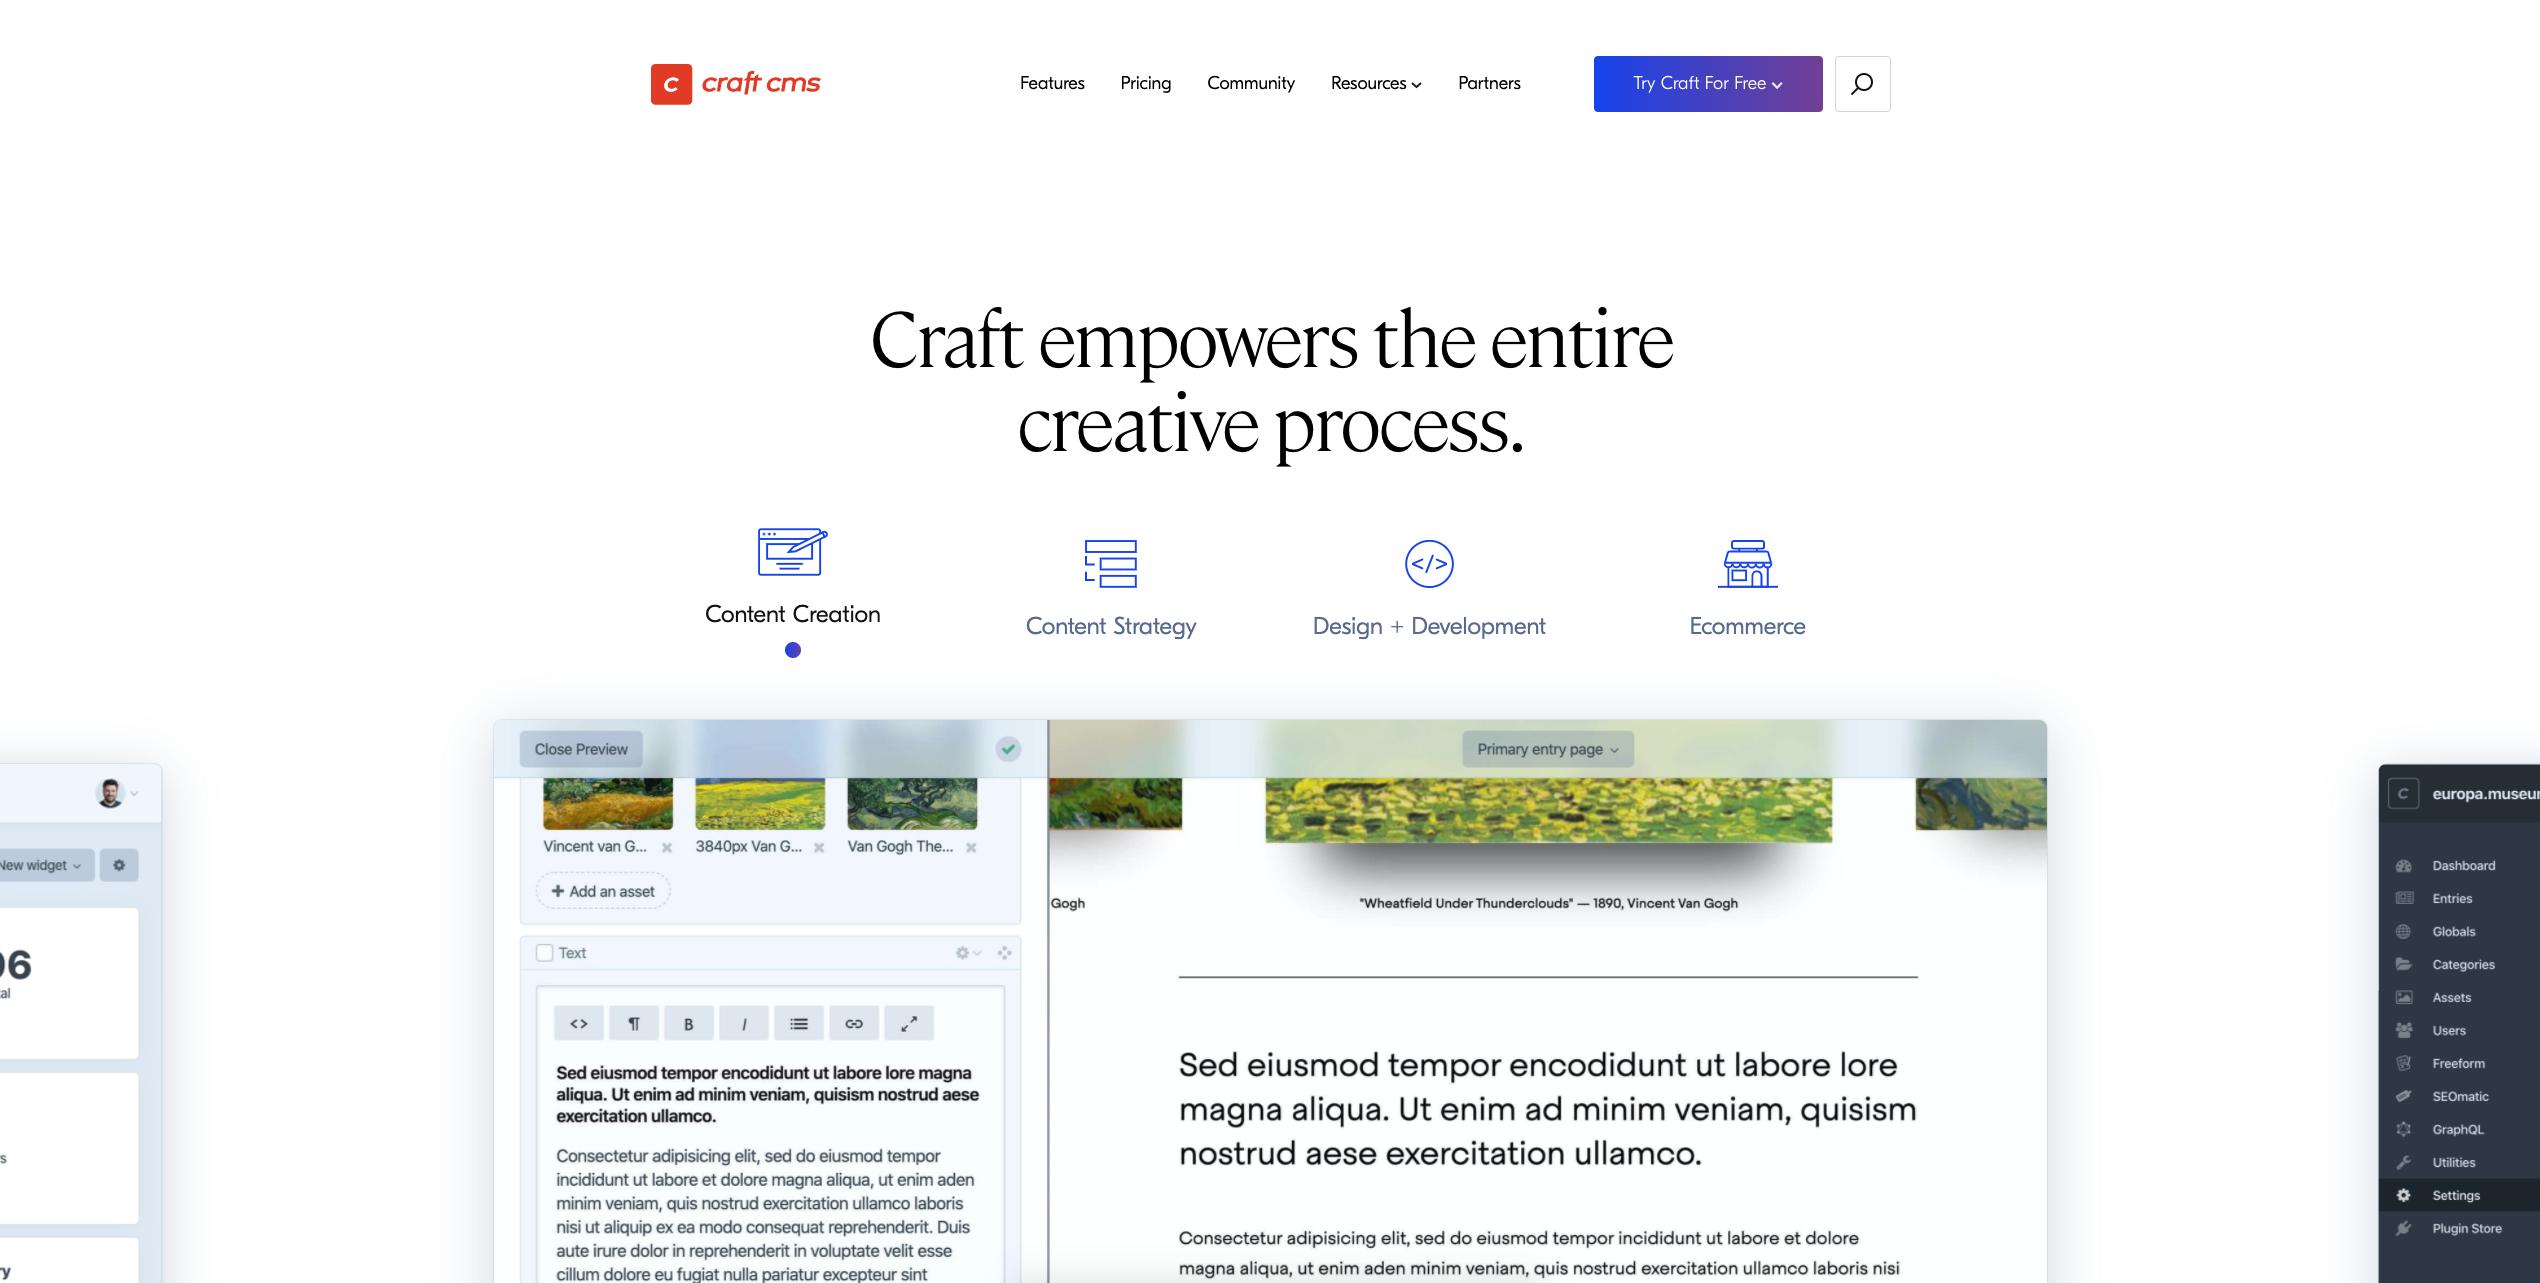 Craft CMS website